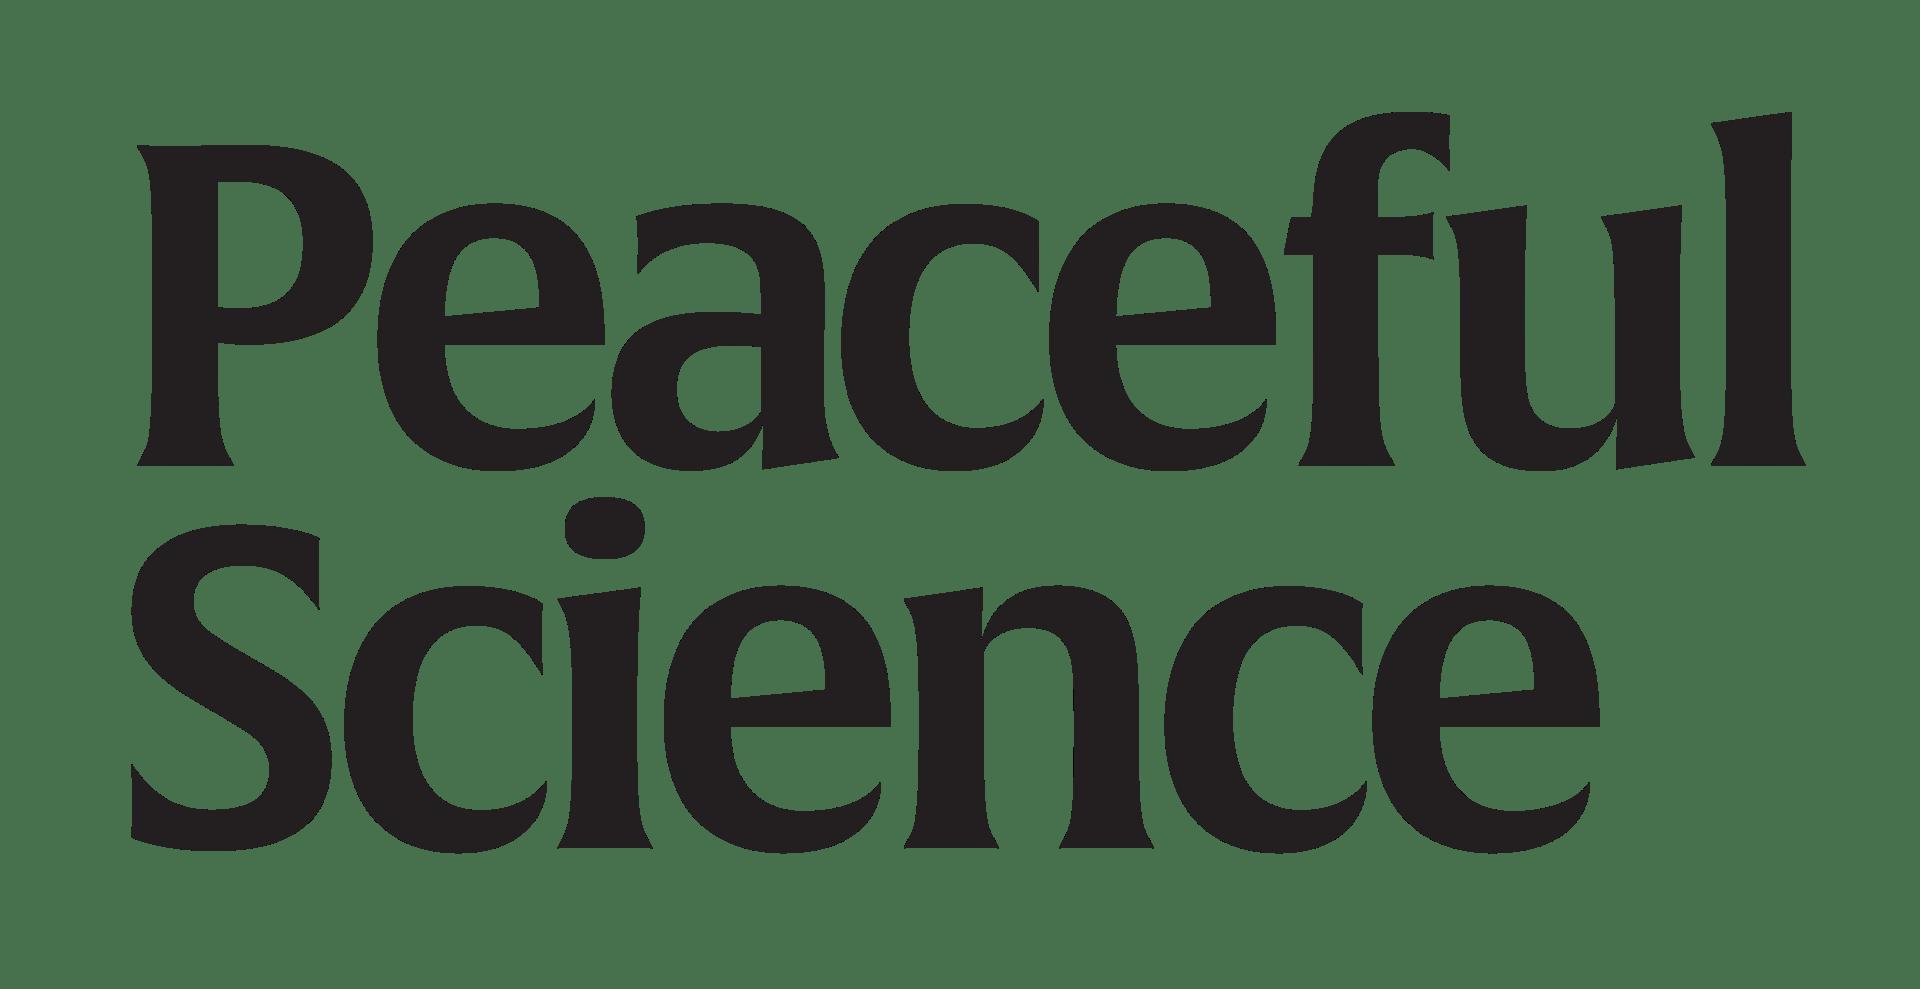 Peaceful Science